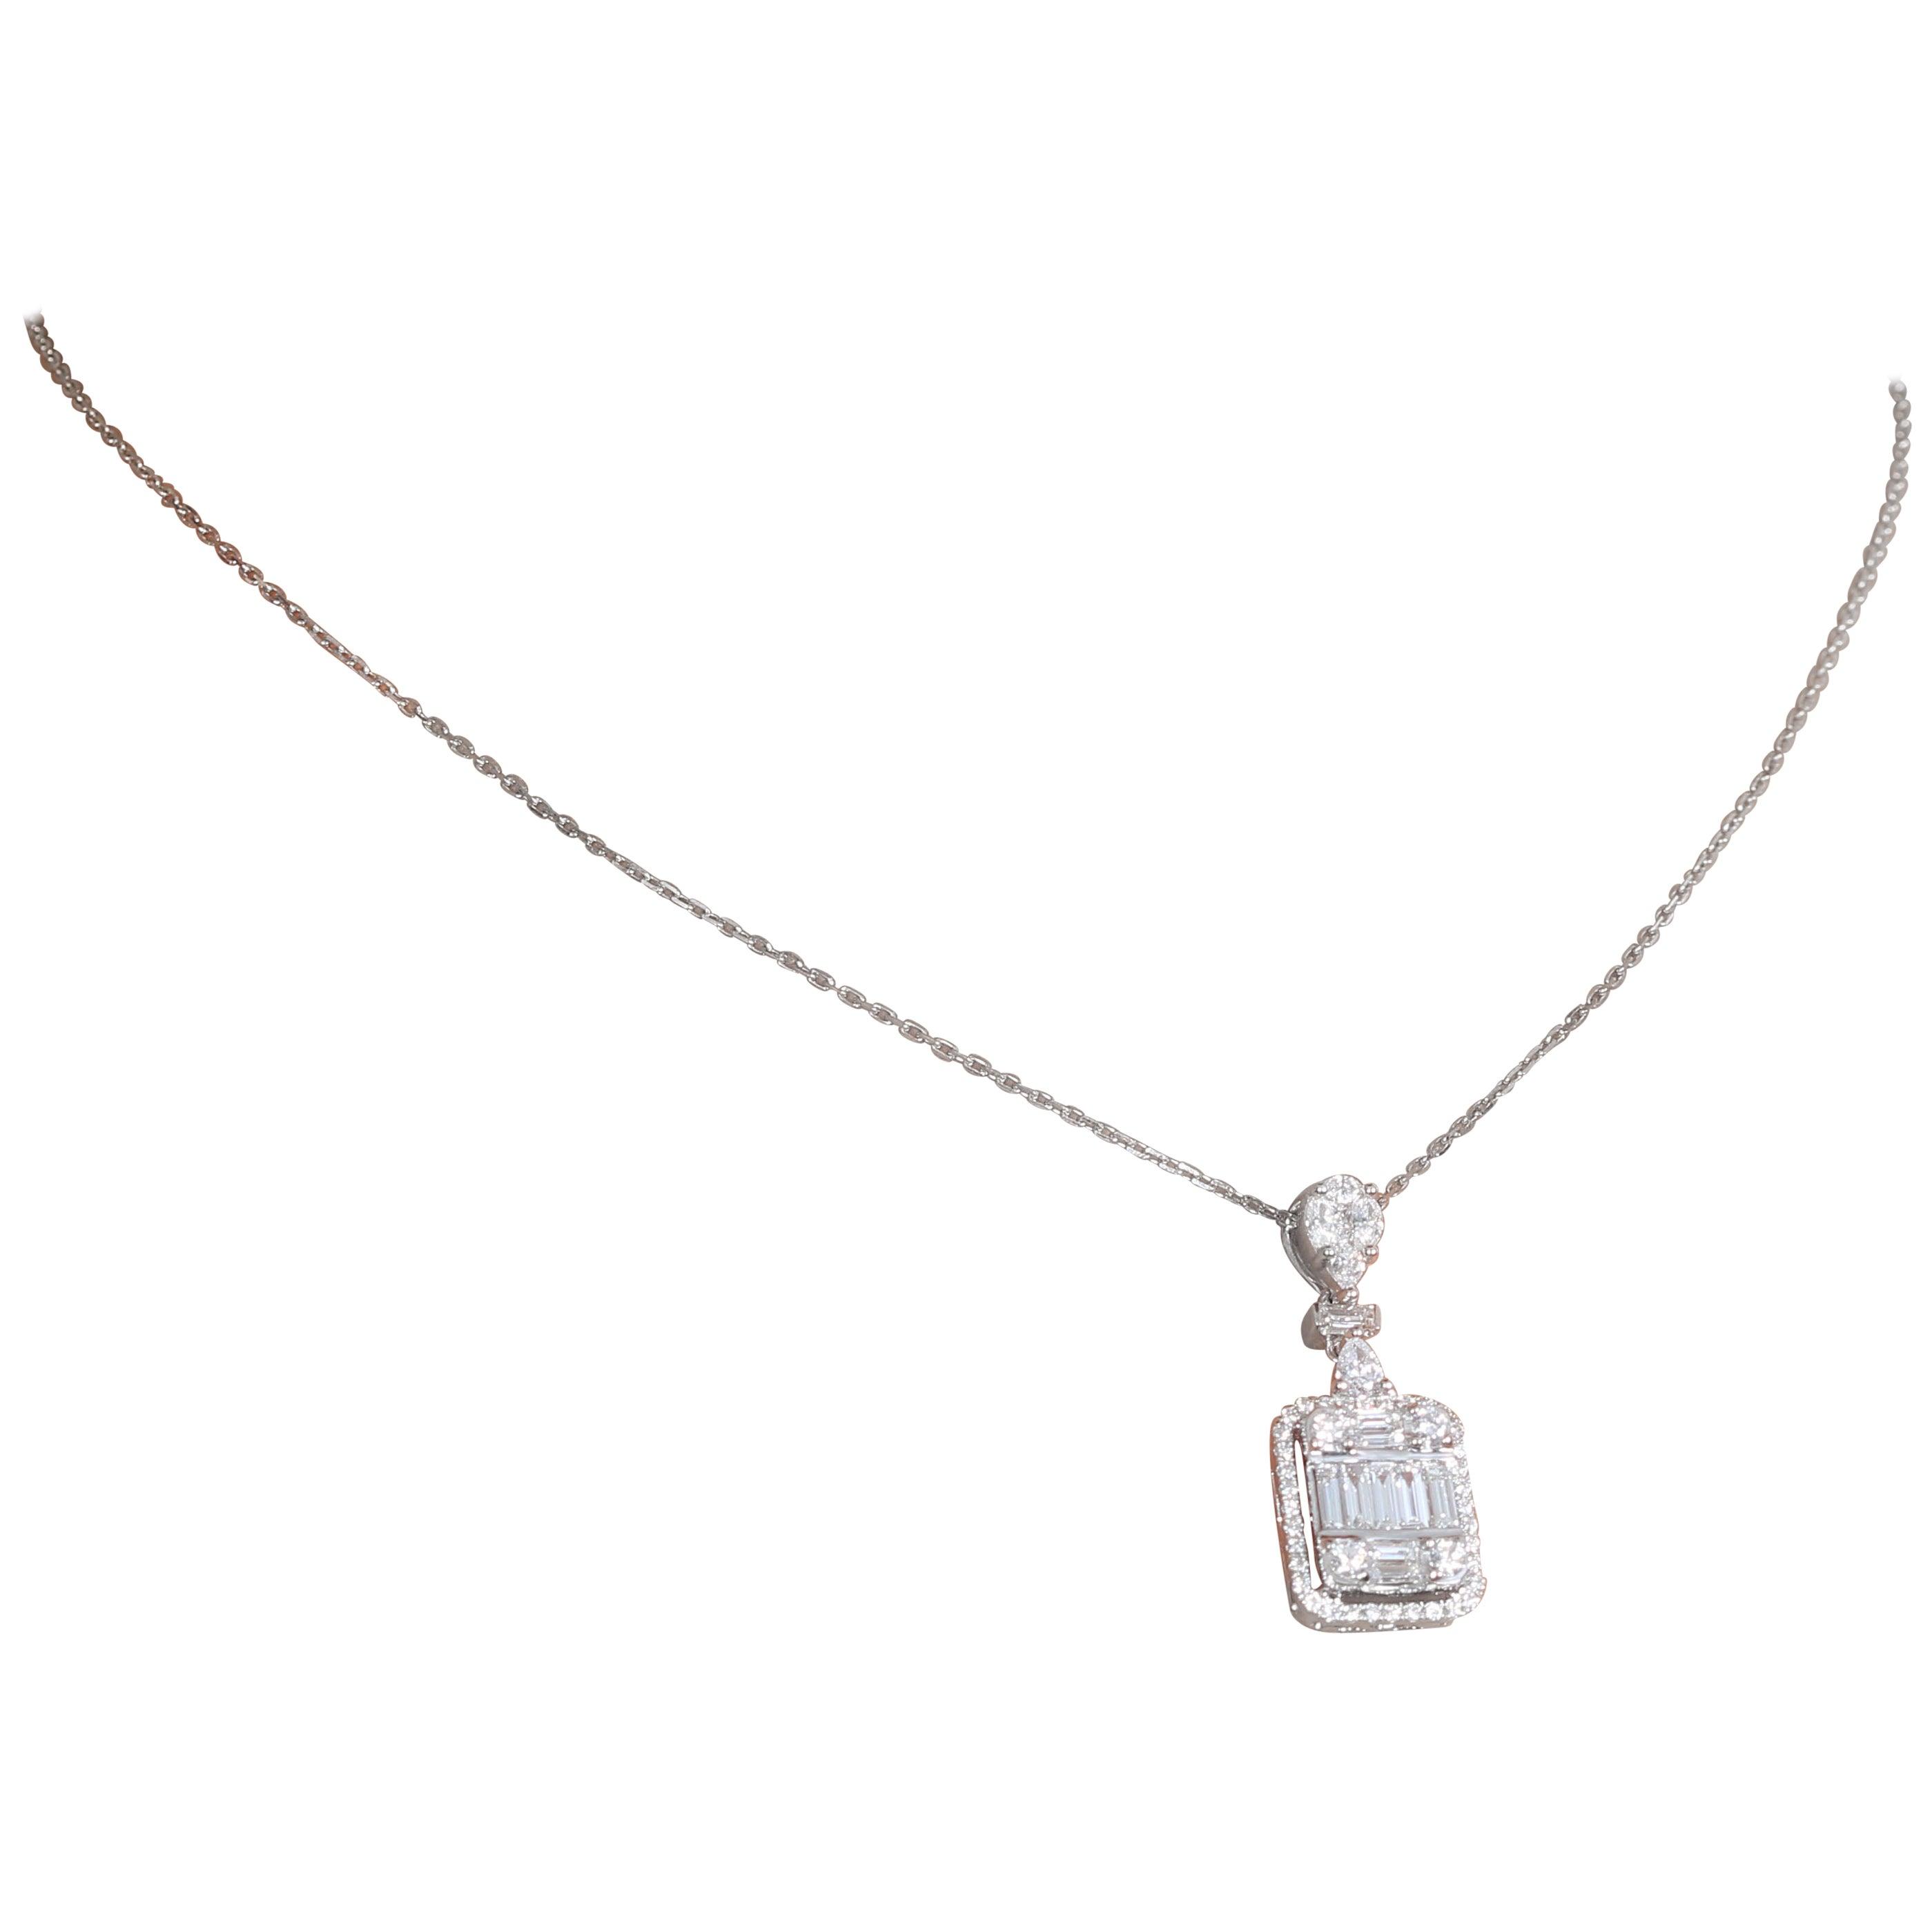 Amwaj White Gold 18 Karat Pendant with Diamond